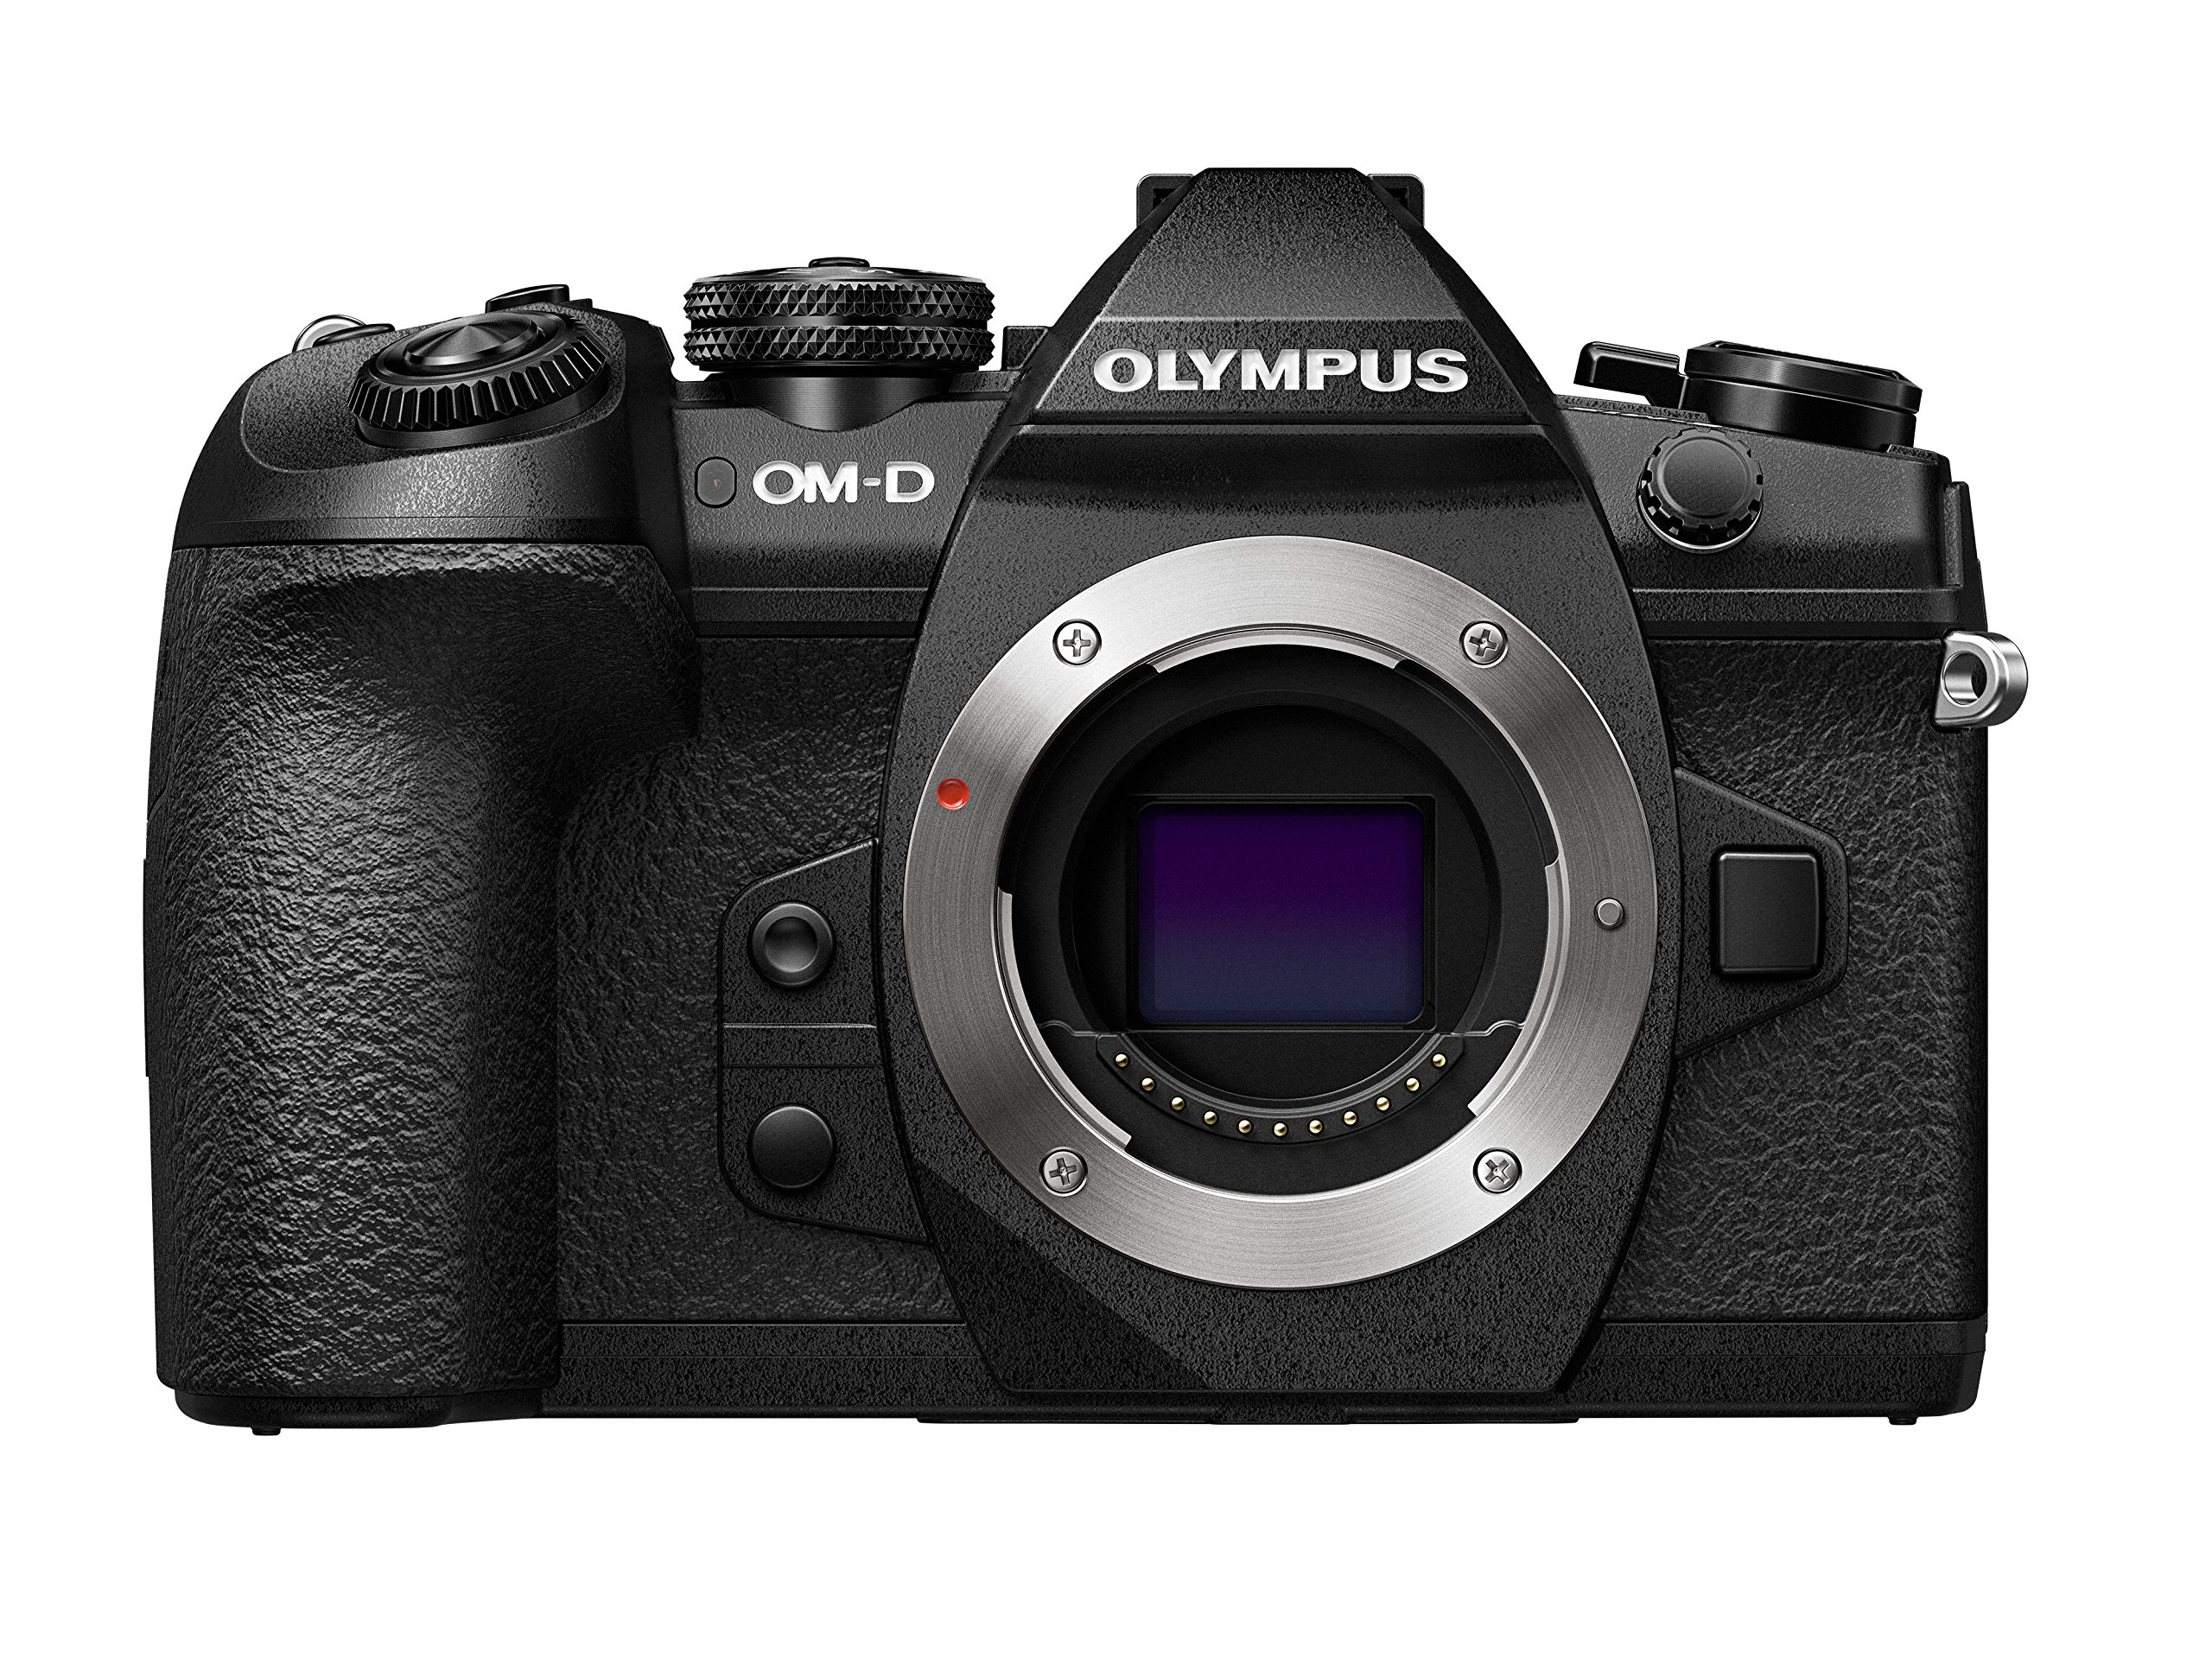 Olympus OM-D E-M1 Mark II 20.4 Megapixel Mirrorless Camera Body Only Black (v207060bu000) by Olympus